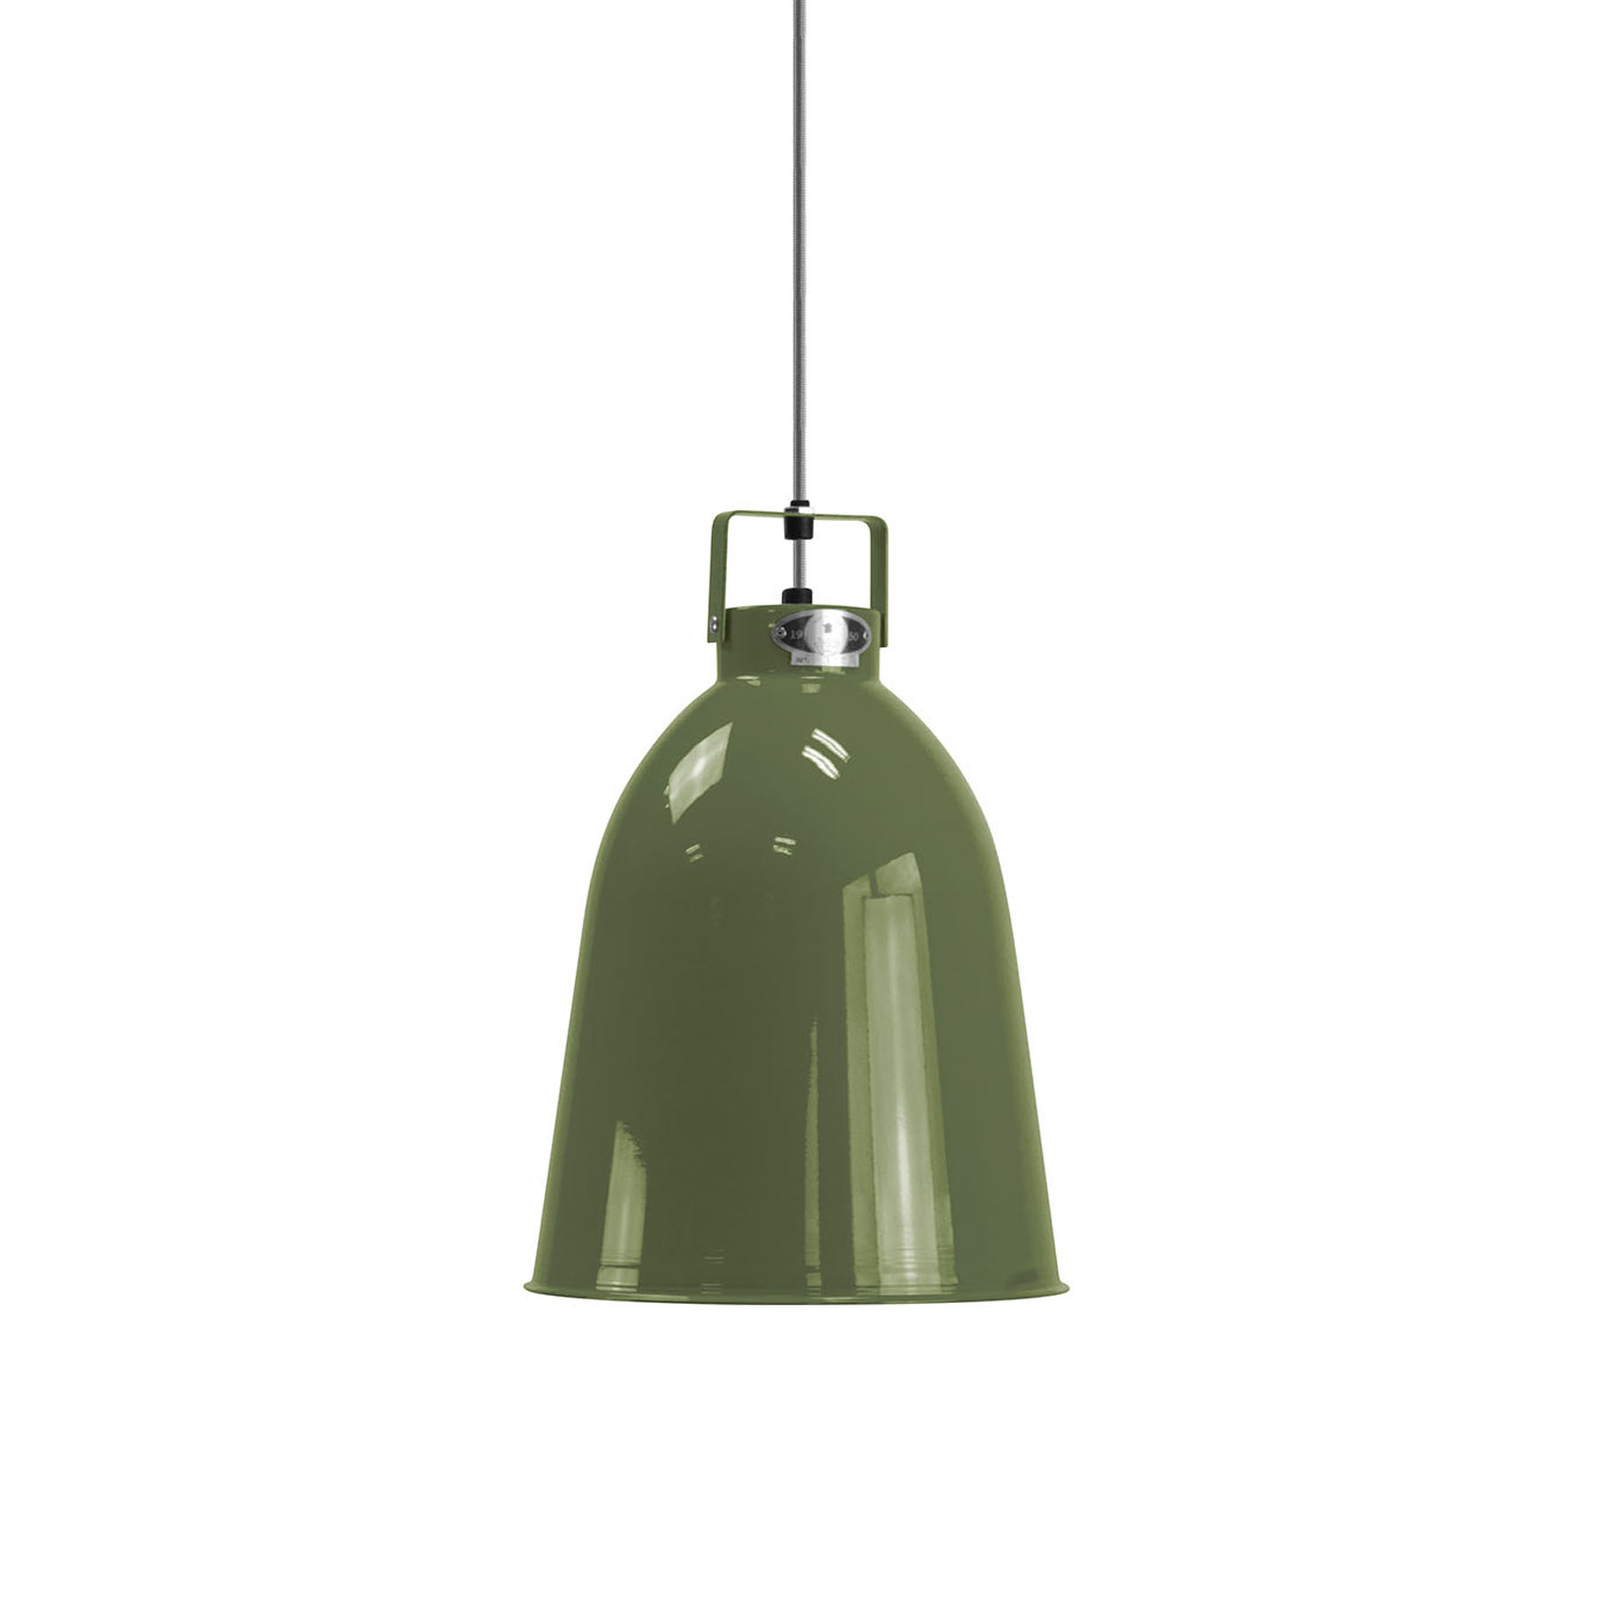 Jieldé Clément C240 lampa wisząca oliwkowa Ø24cm